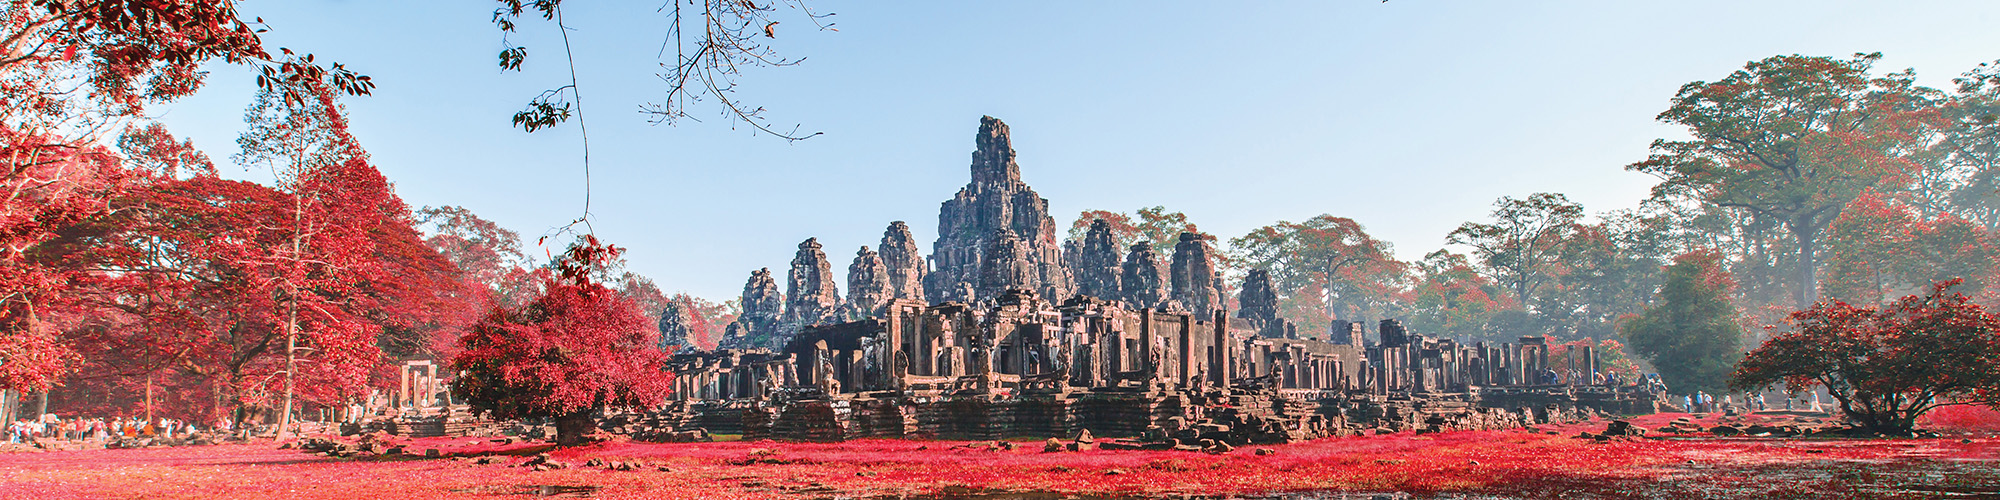 cambodia-banner-5.jpg